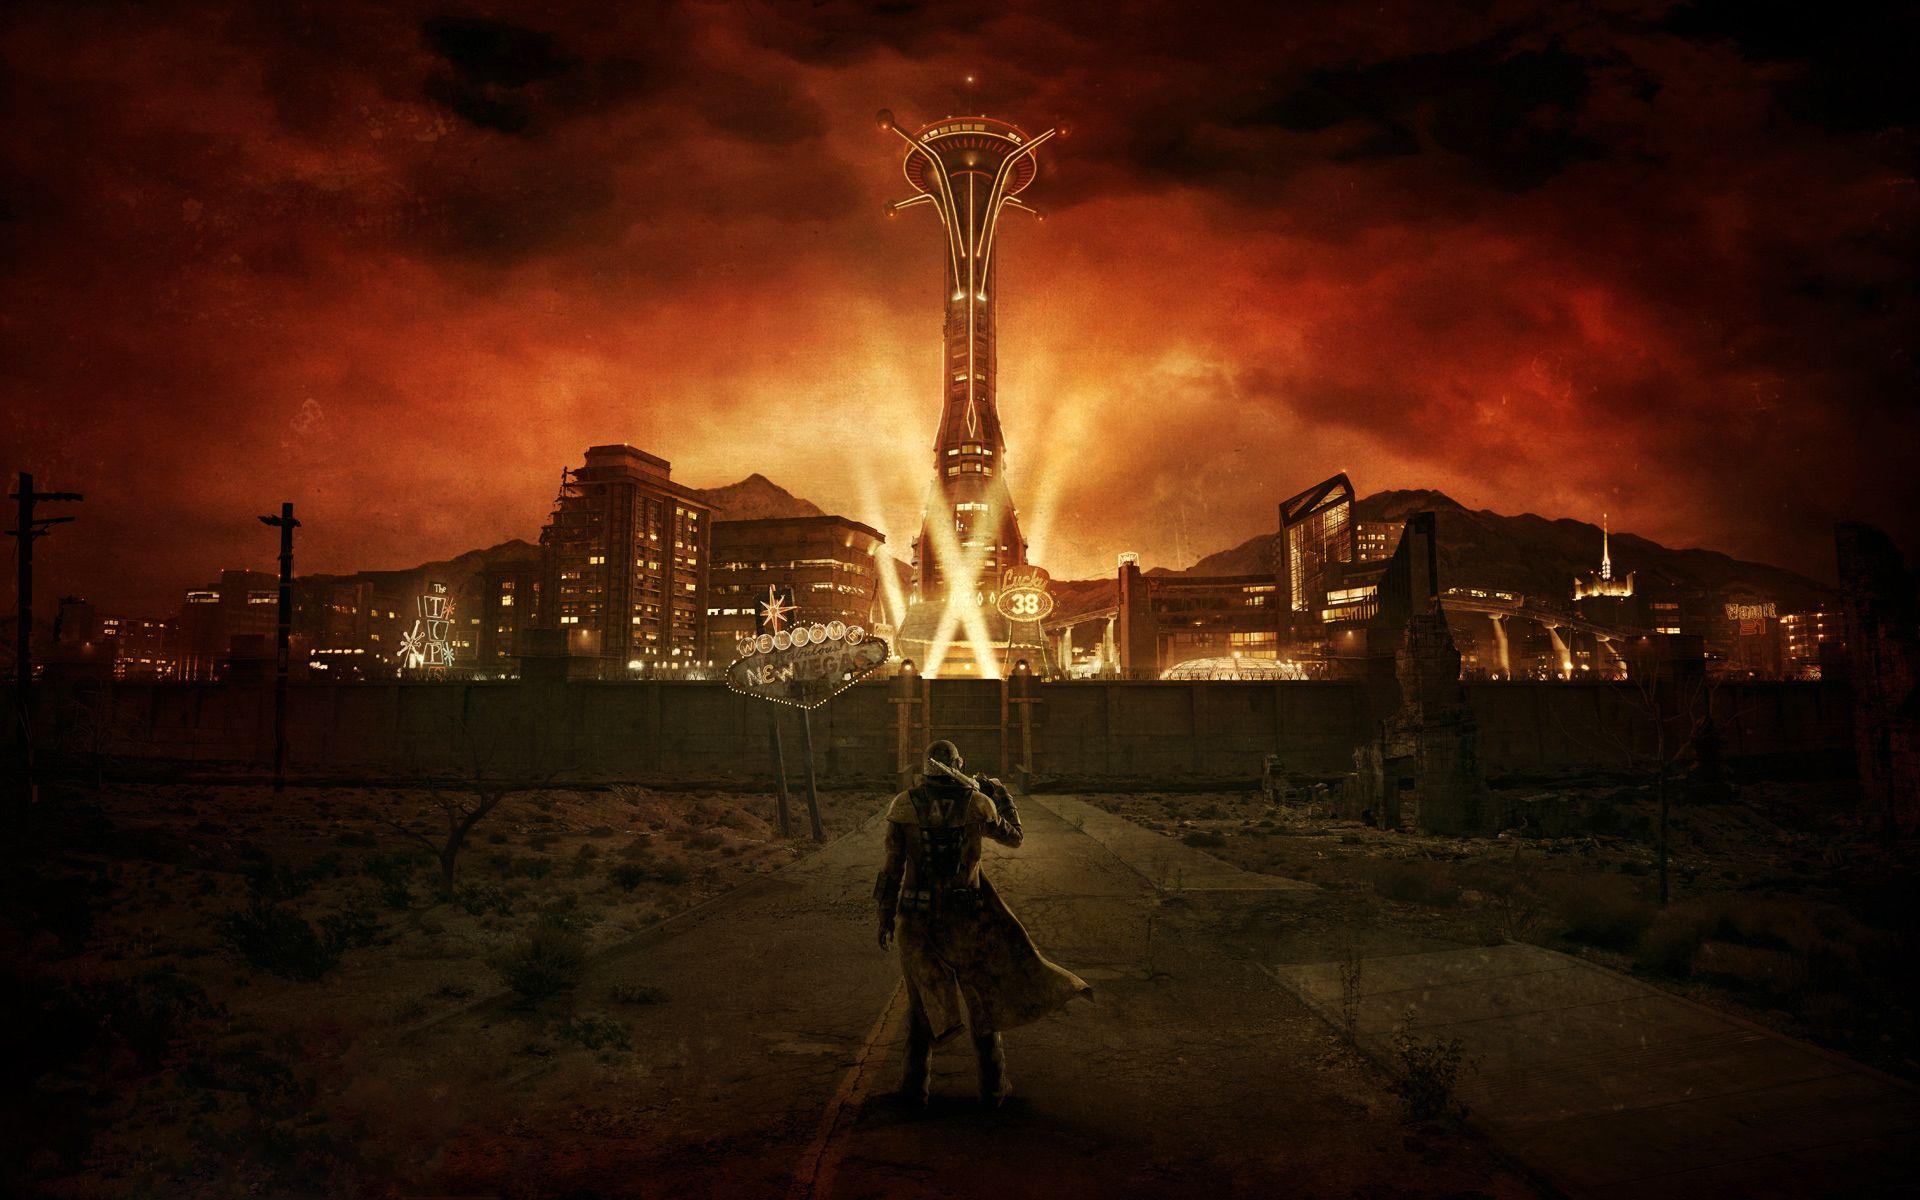 New Vegas Fallout Wallpaper Fallout New Vegas Fallout Movie